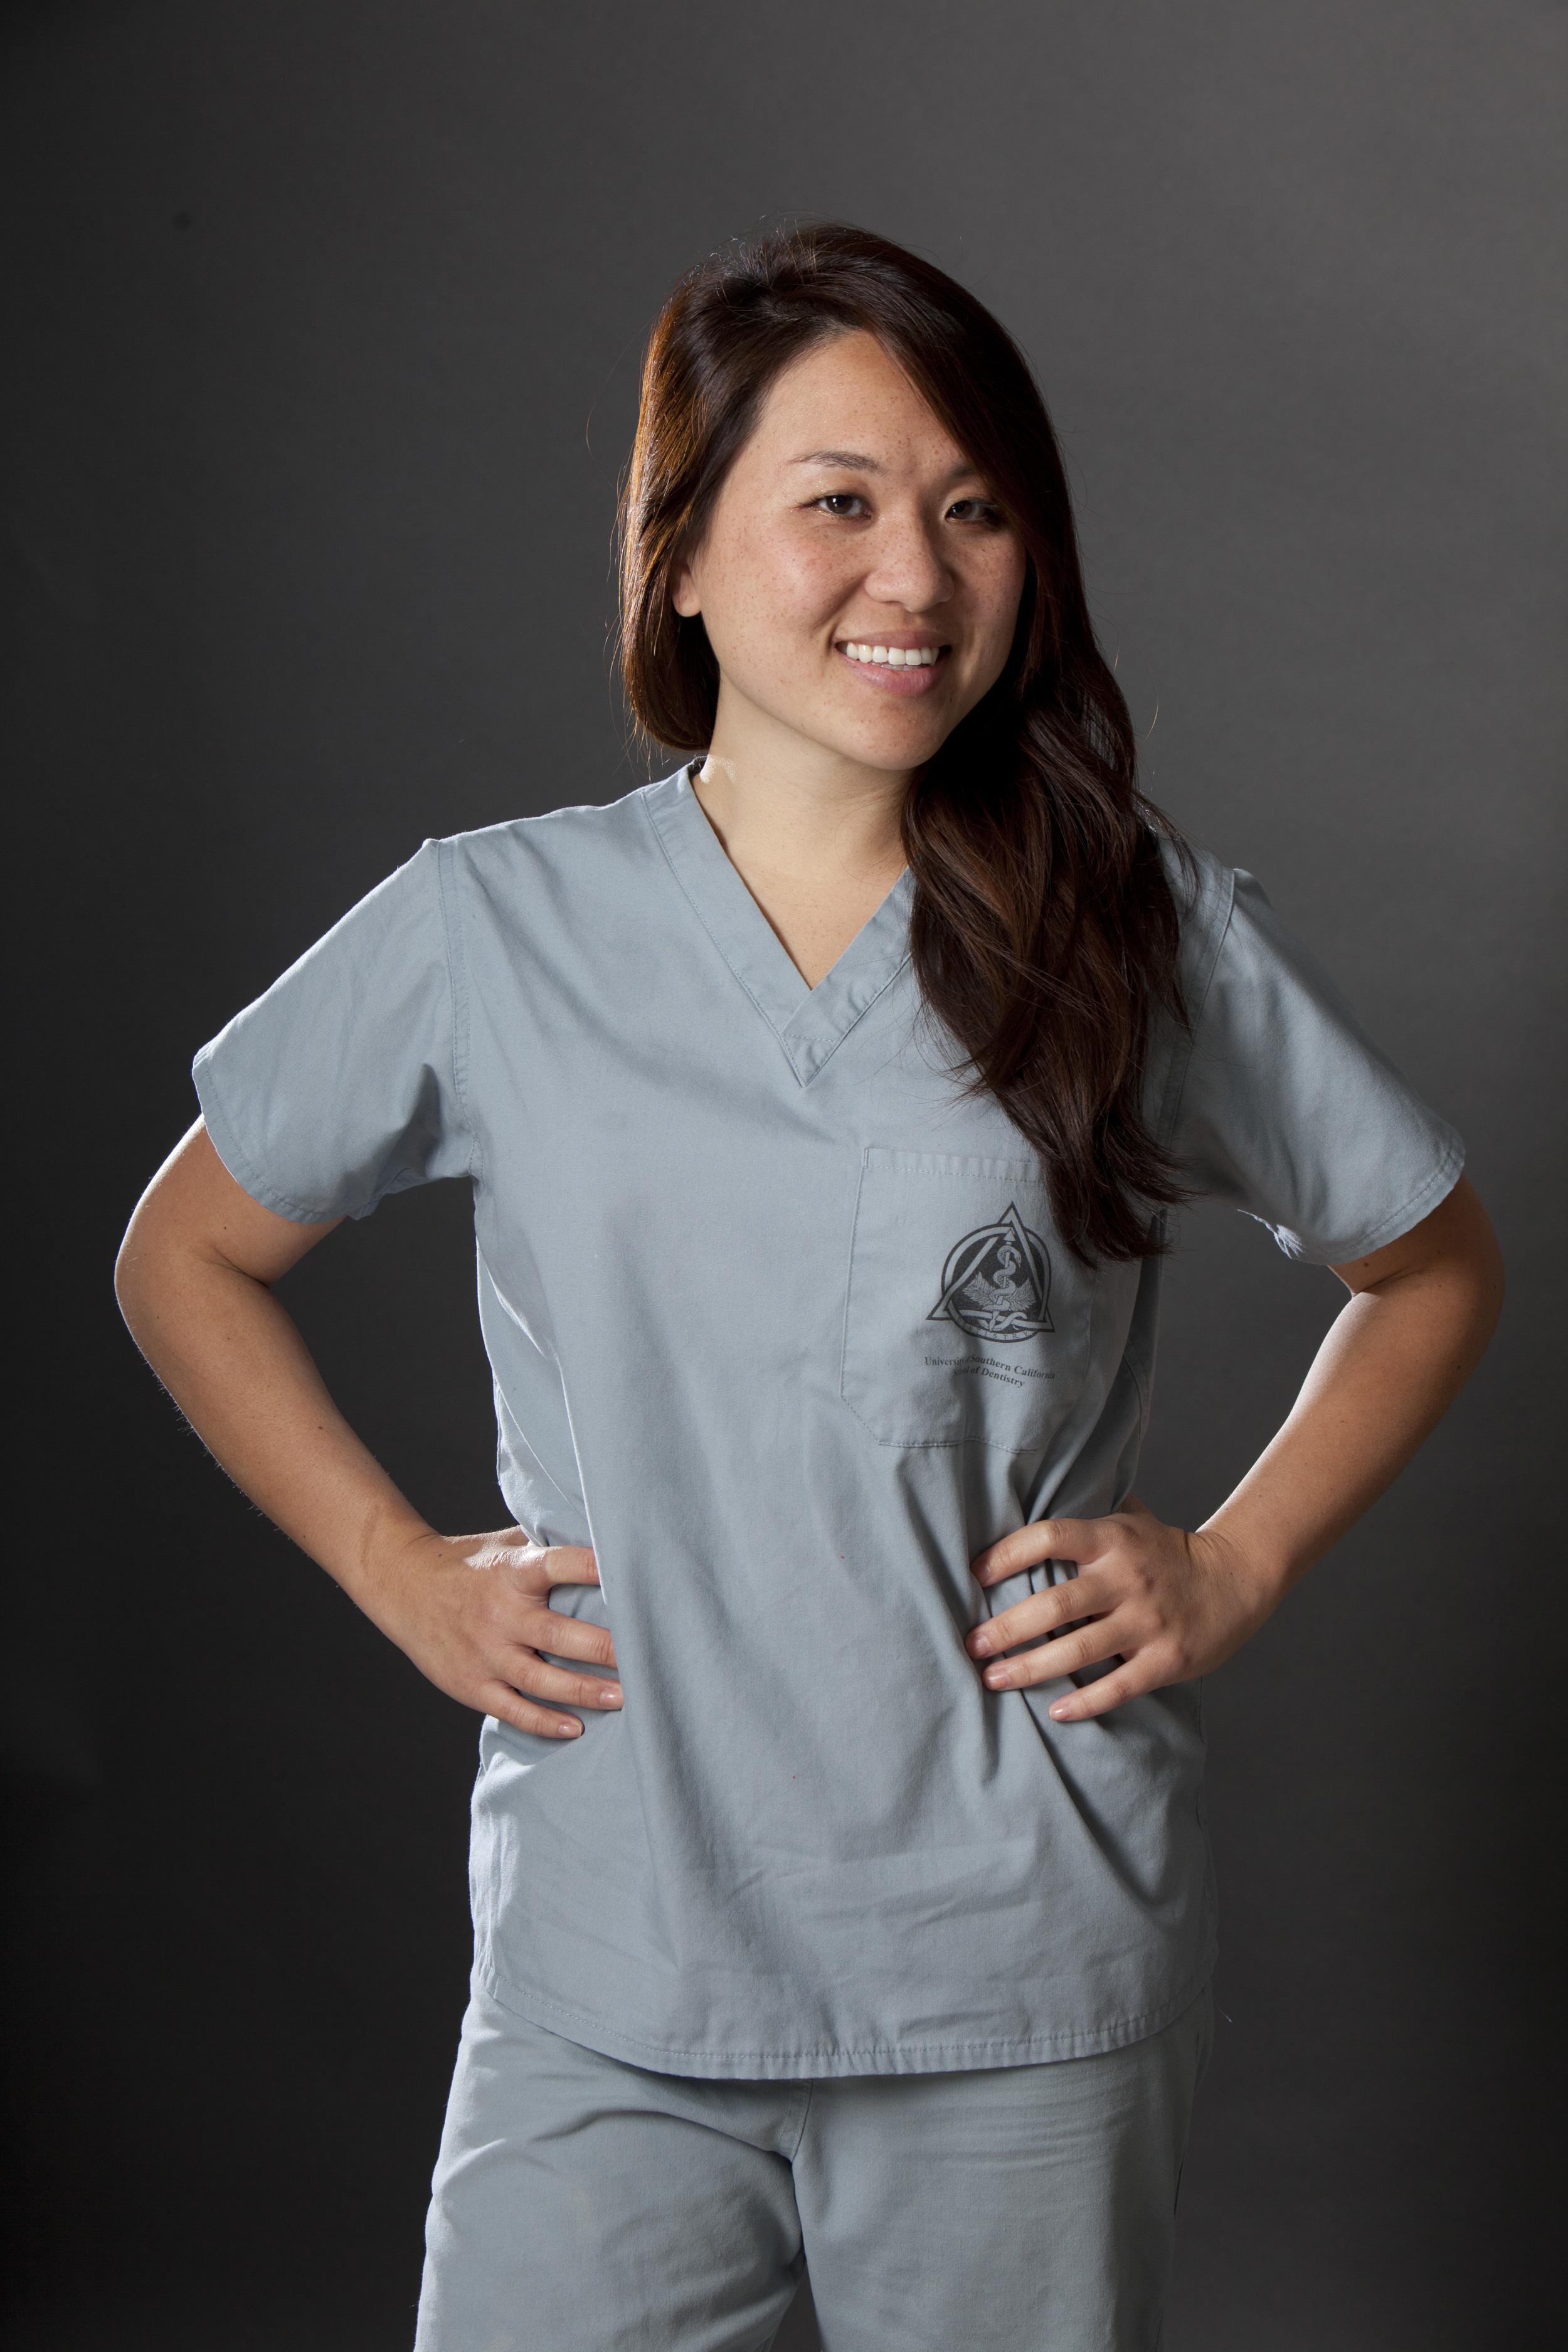 Dr. Cynthia Young